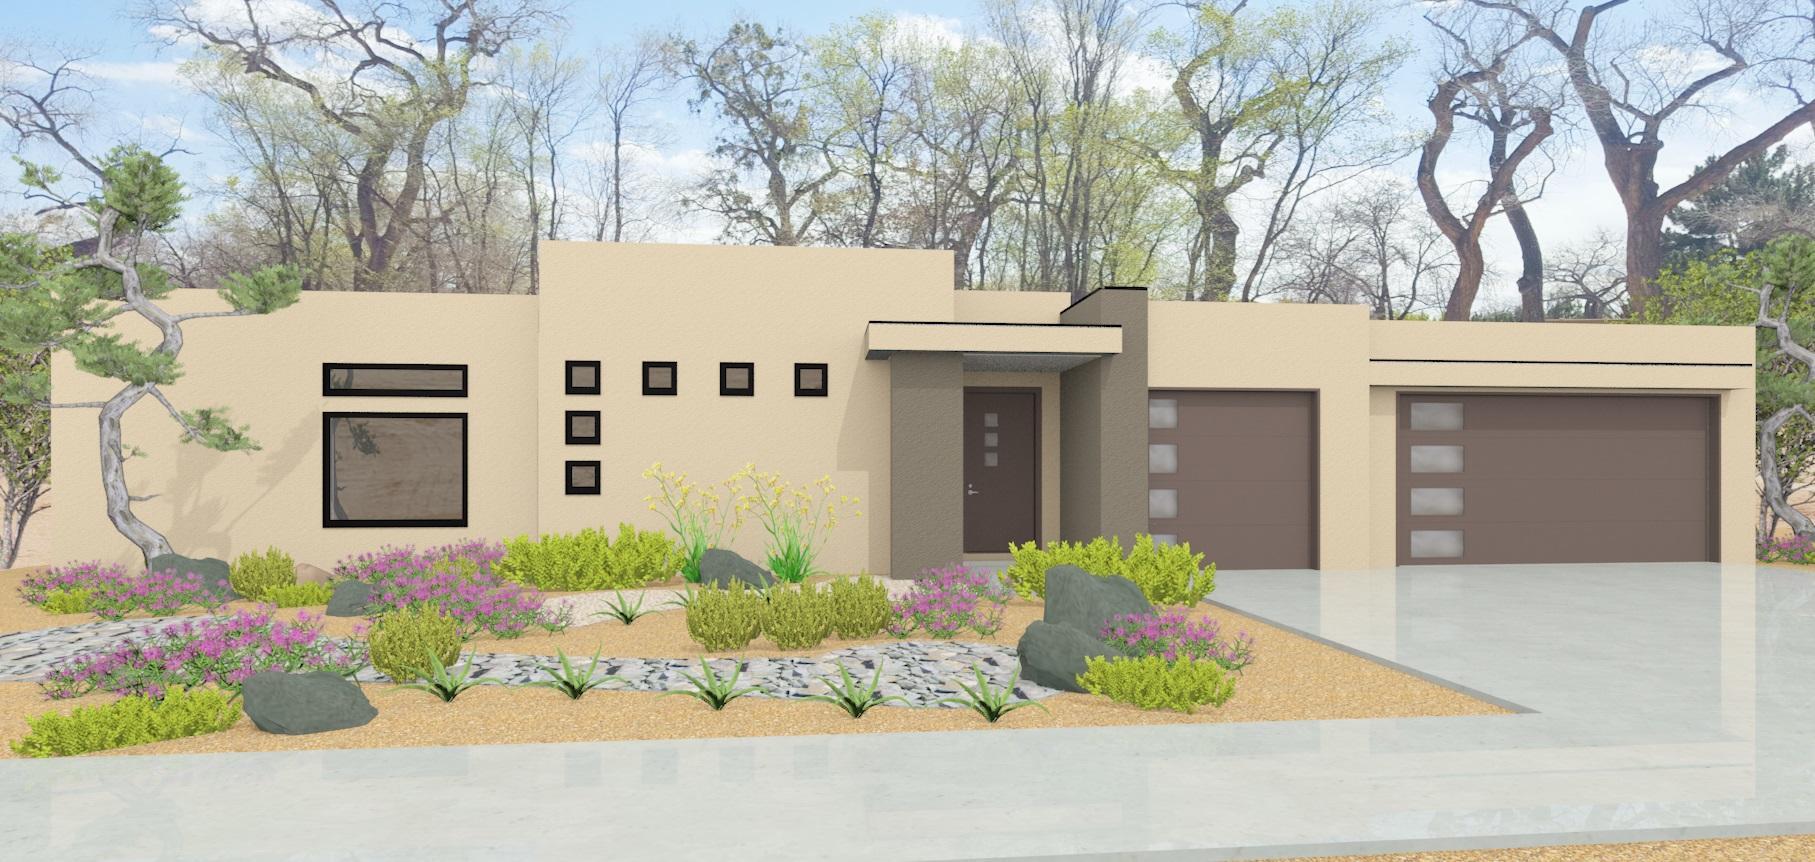 243 NW Vista Azul Lane, Northwest Albuquerque and Northwest Heights, New Mexico